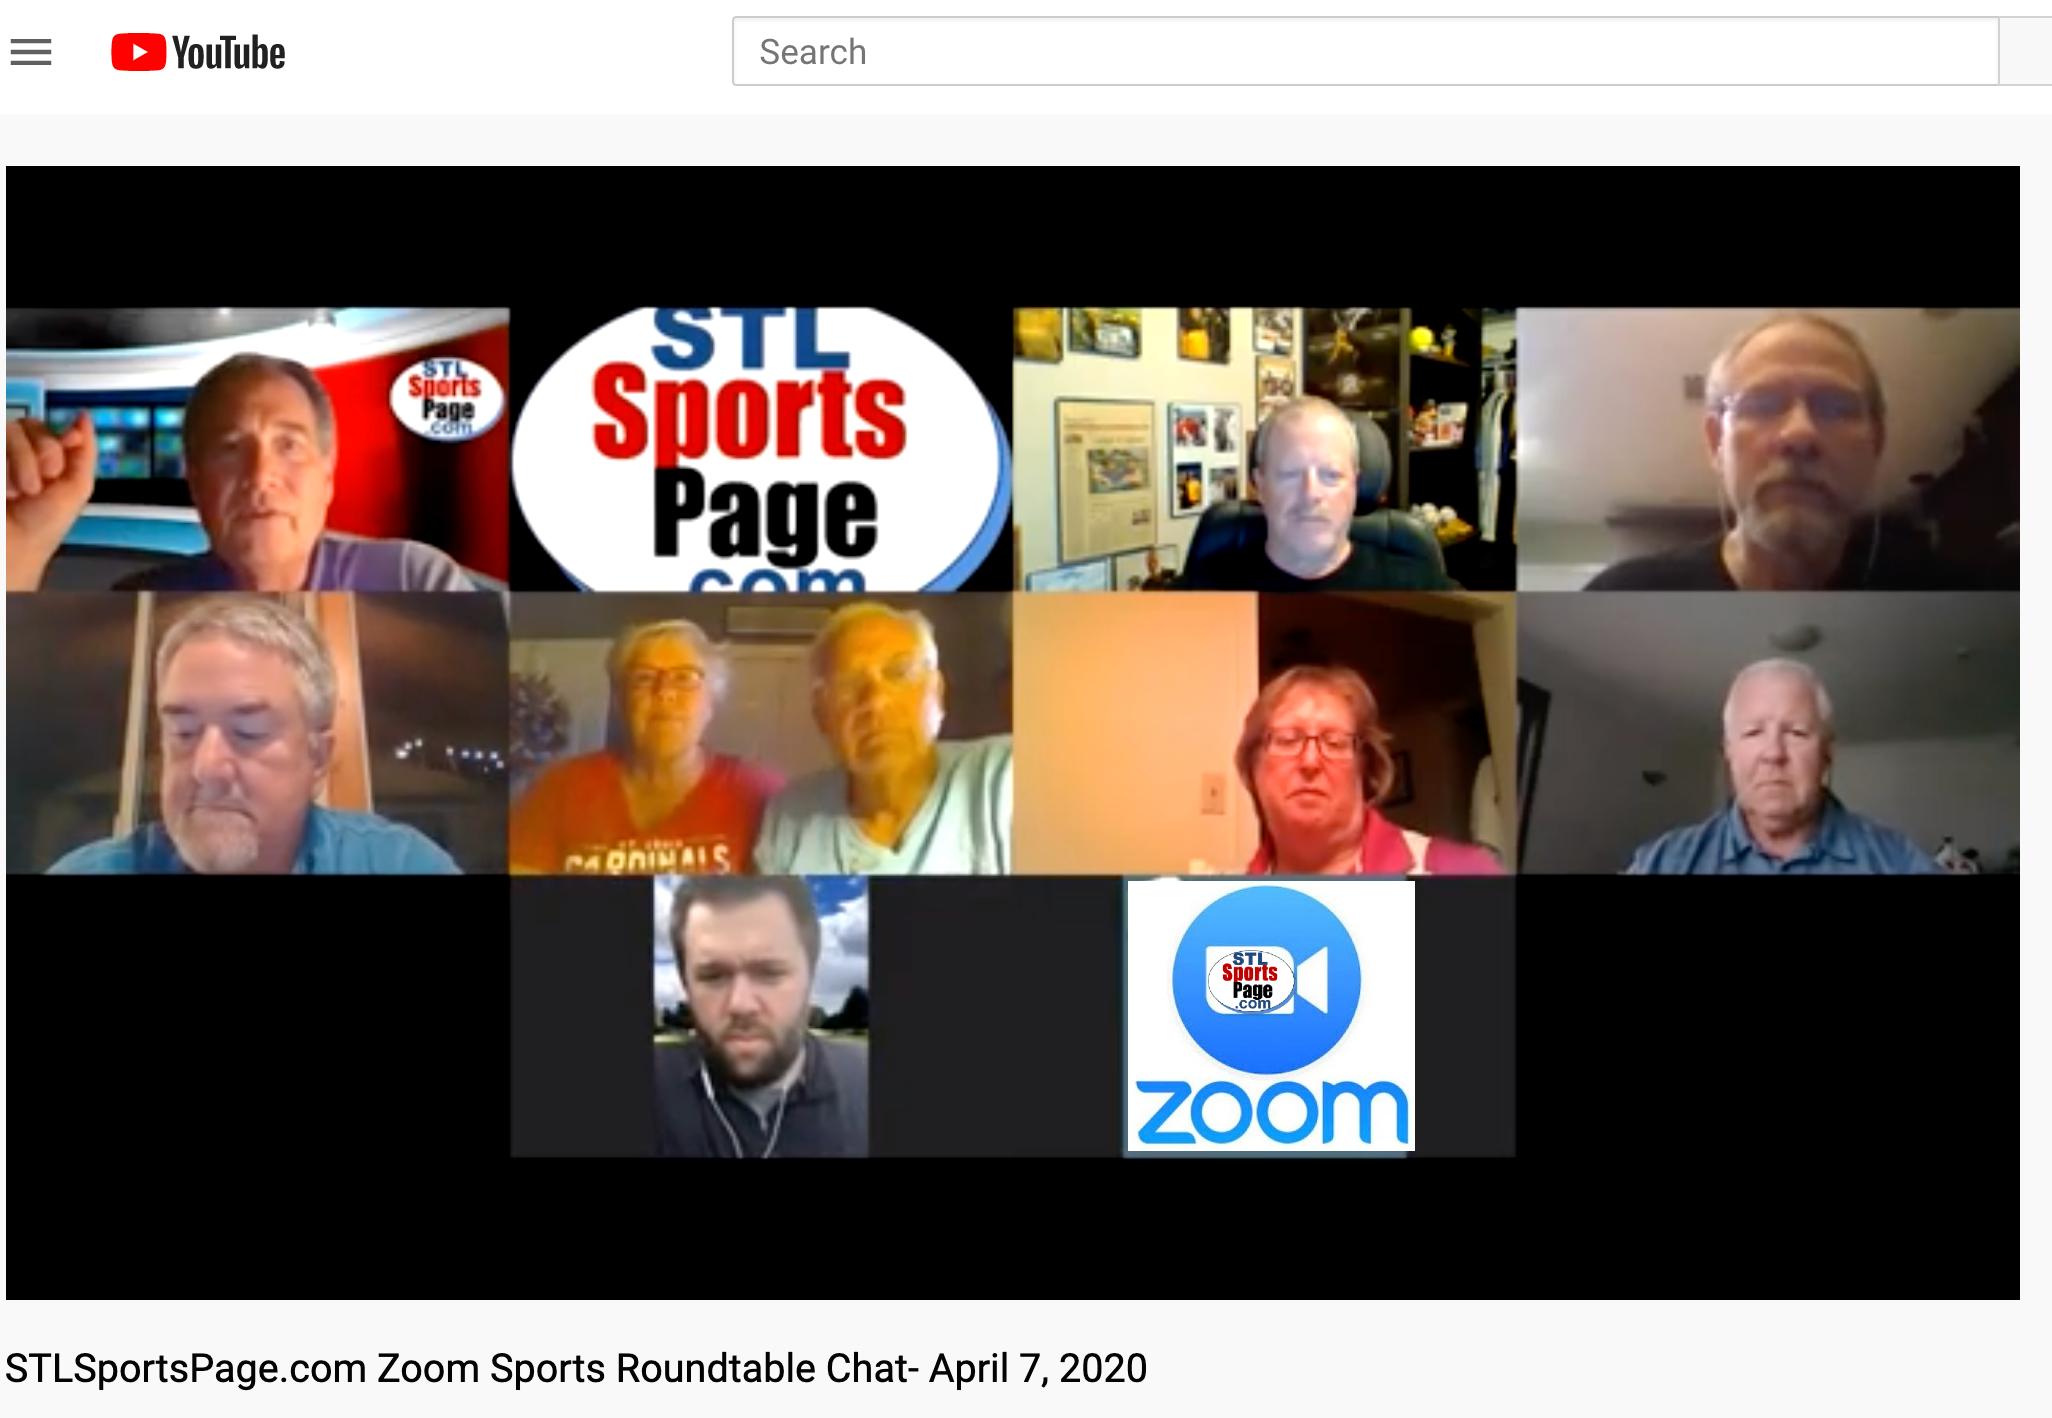 GOOD Screenshot of 1st Zoom Baseball Conversation